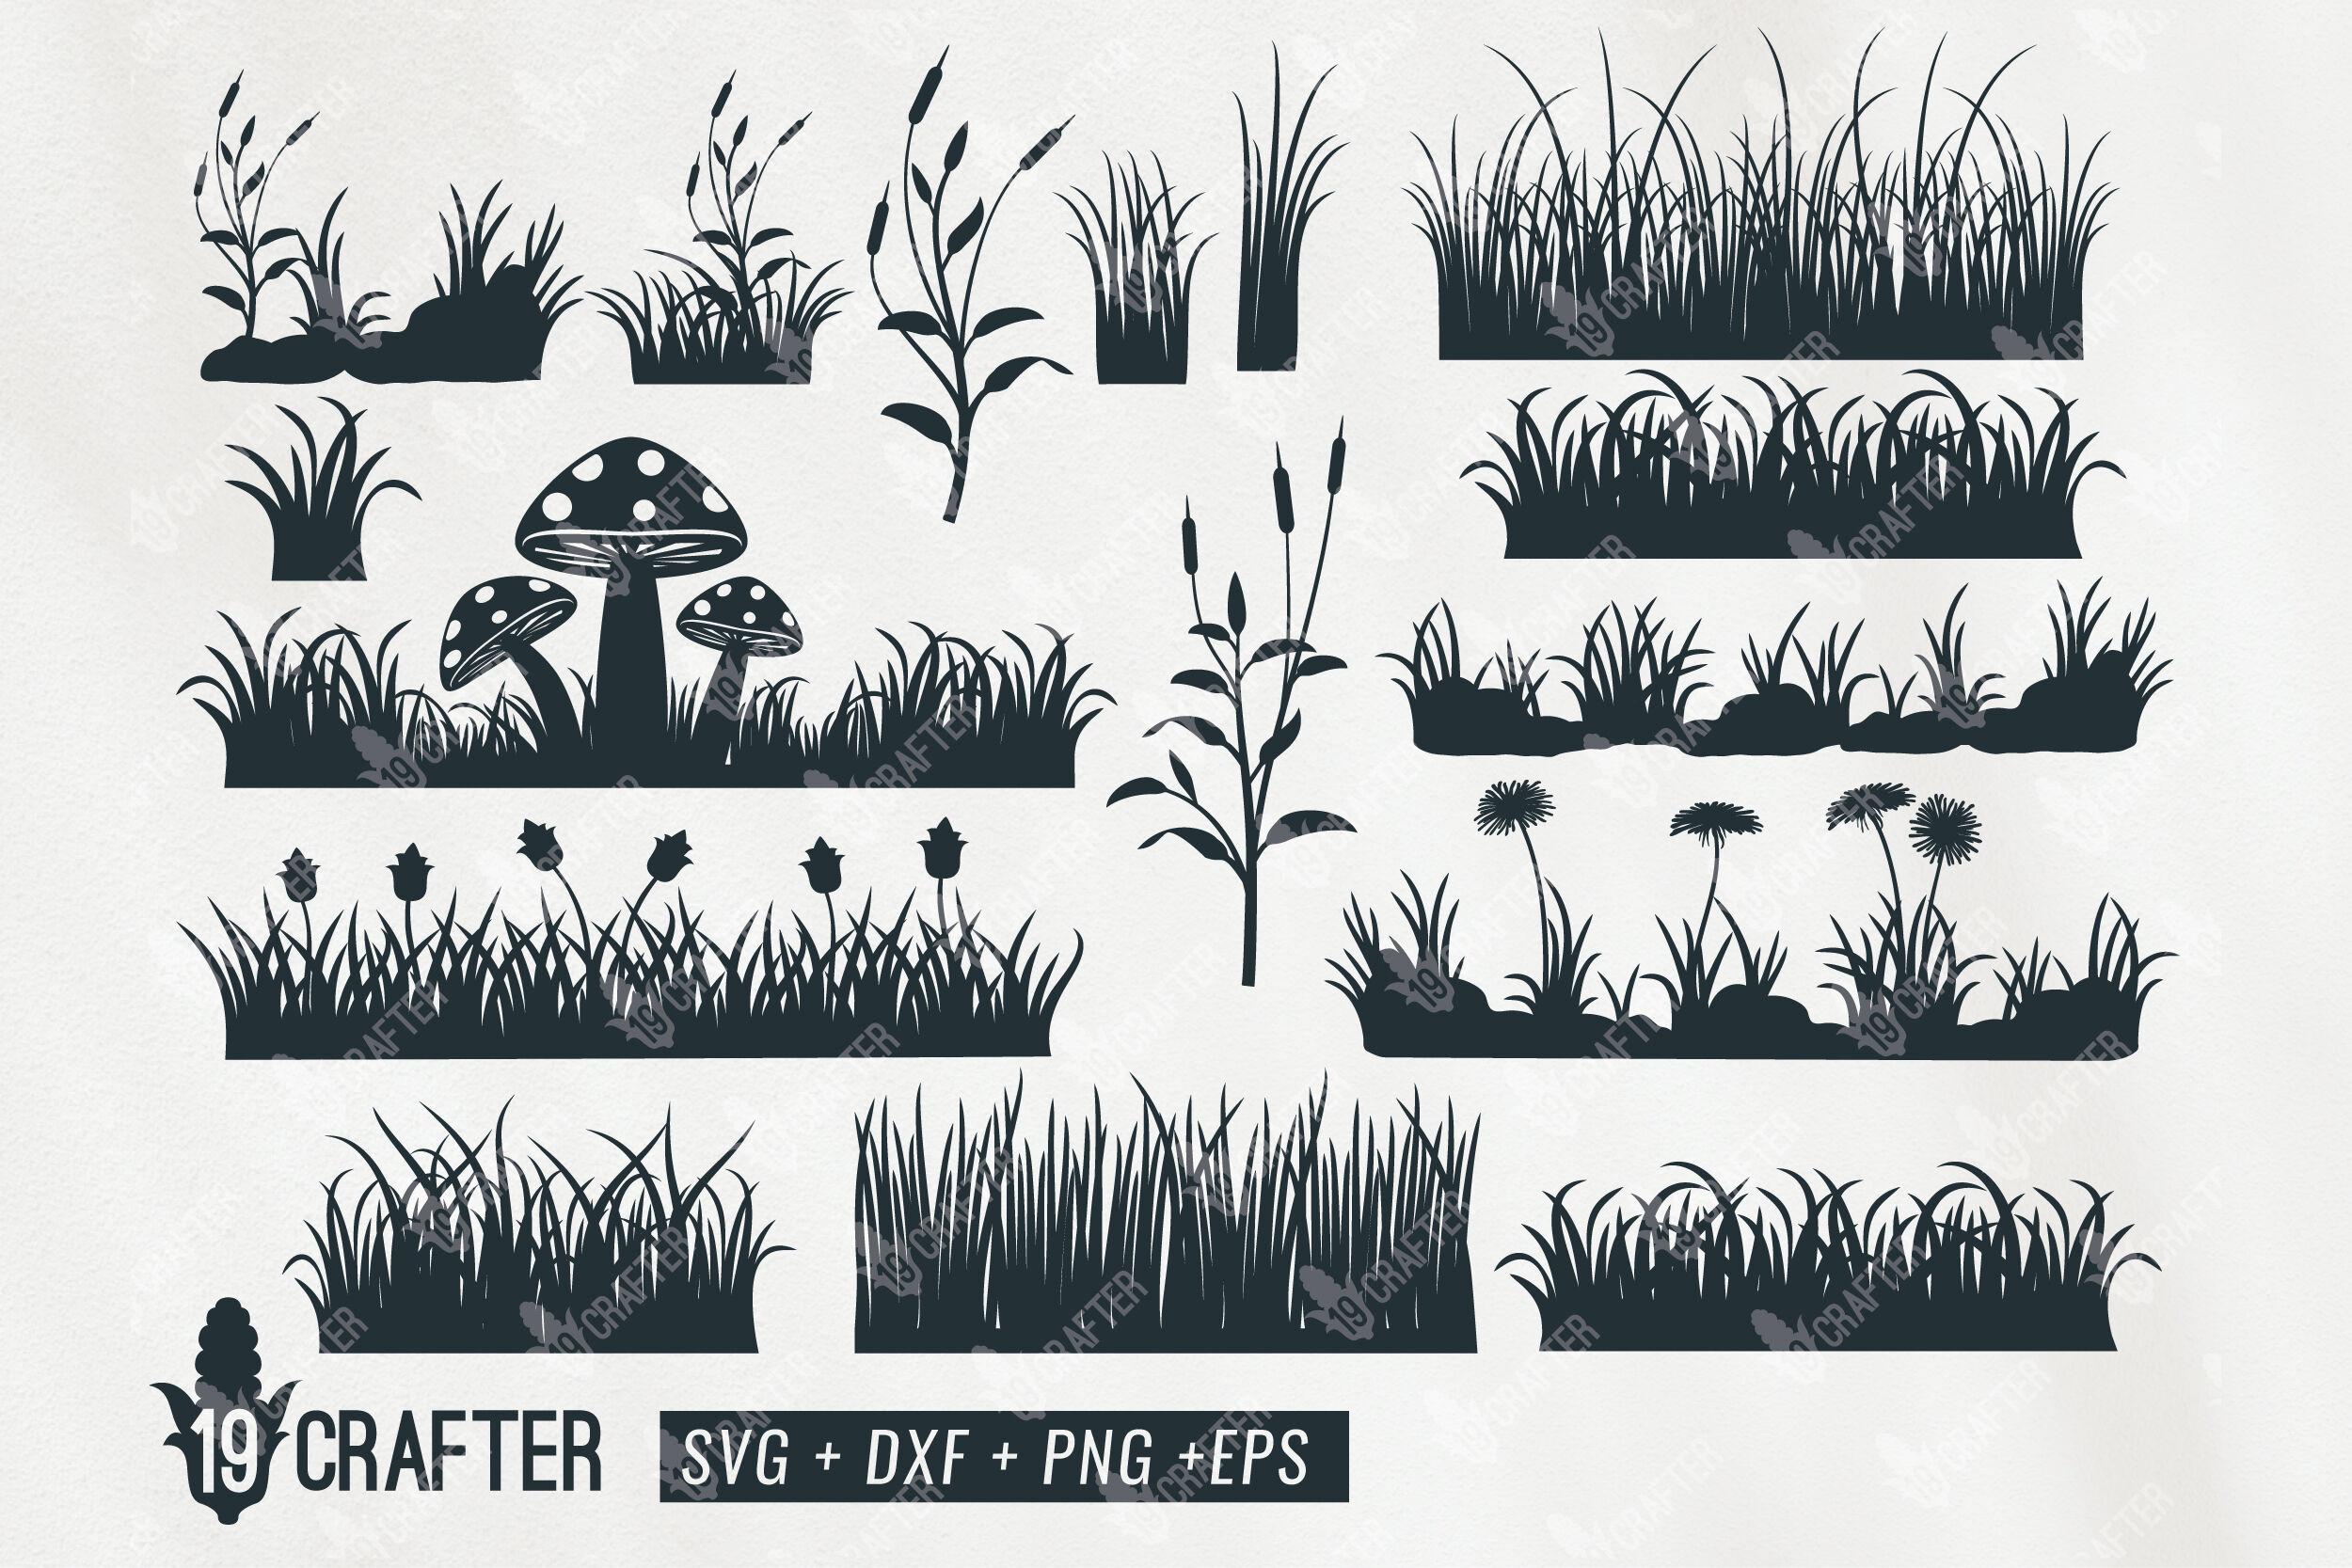 Grass Field Flower And Mushroom Svg Bundle By Greatype19